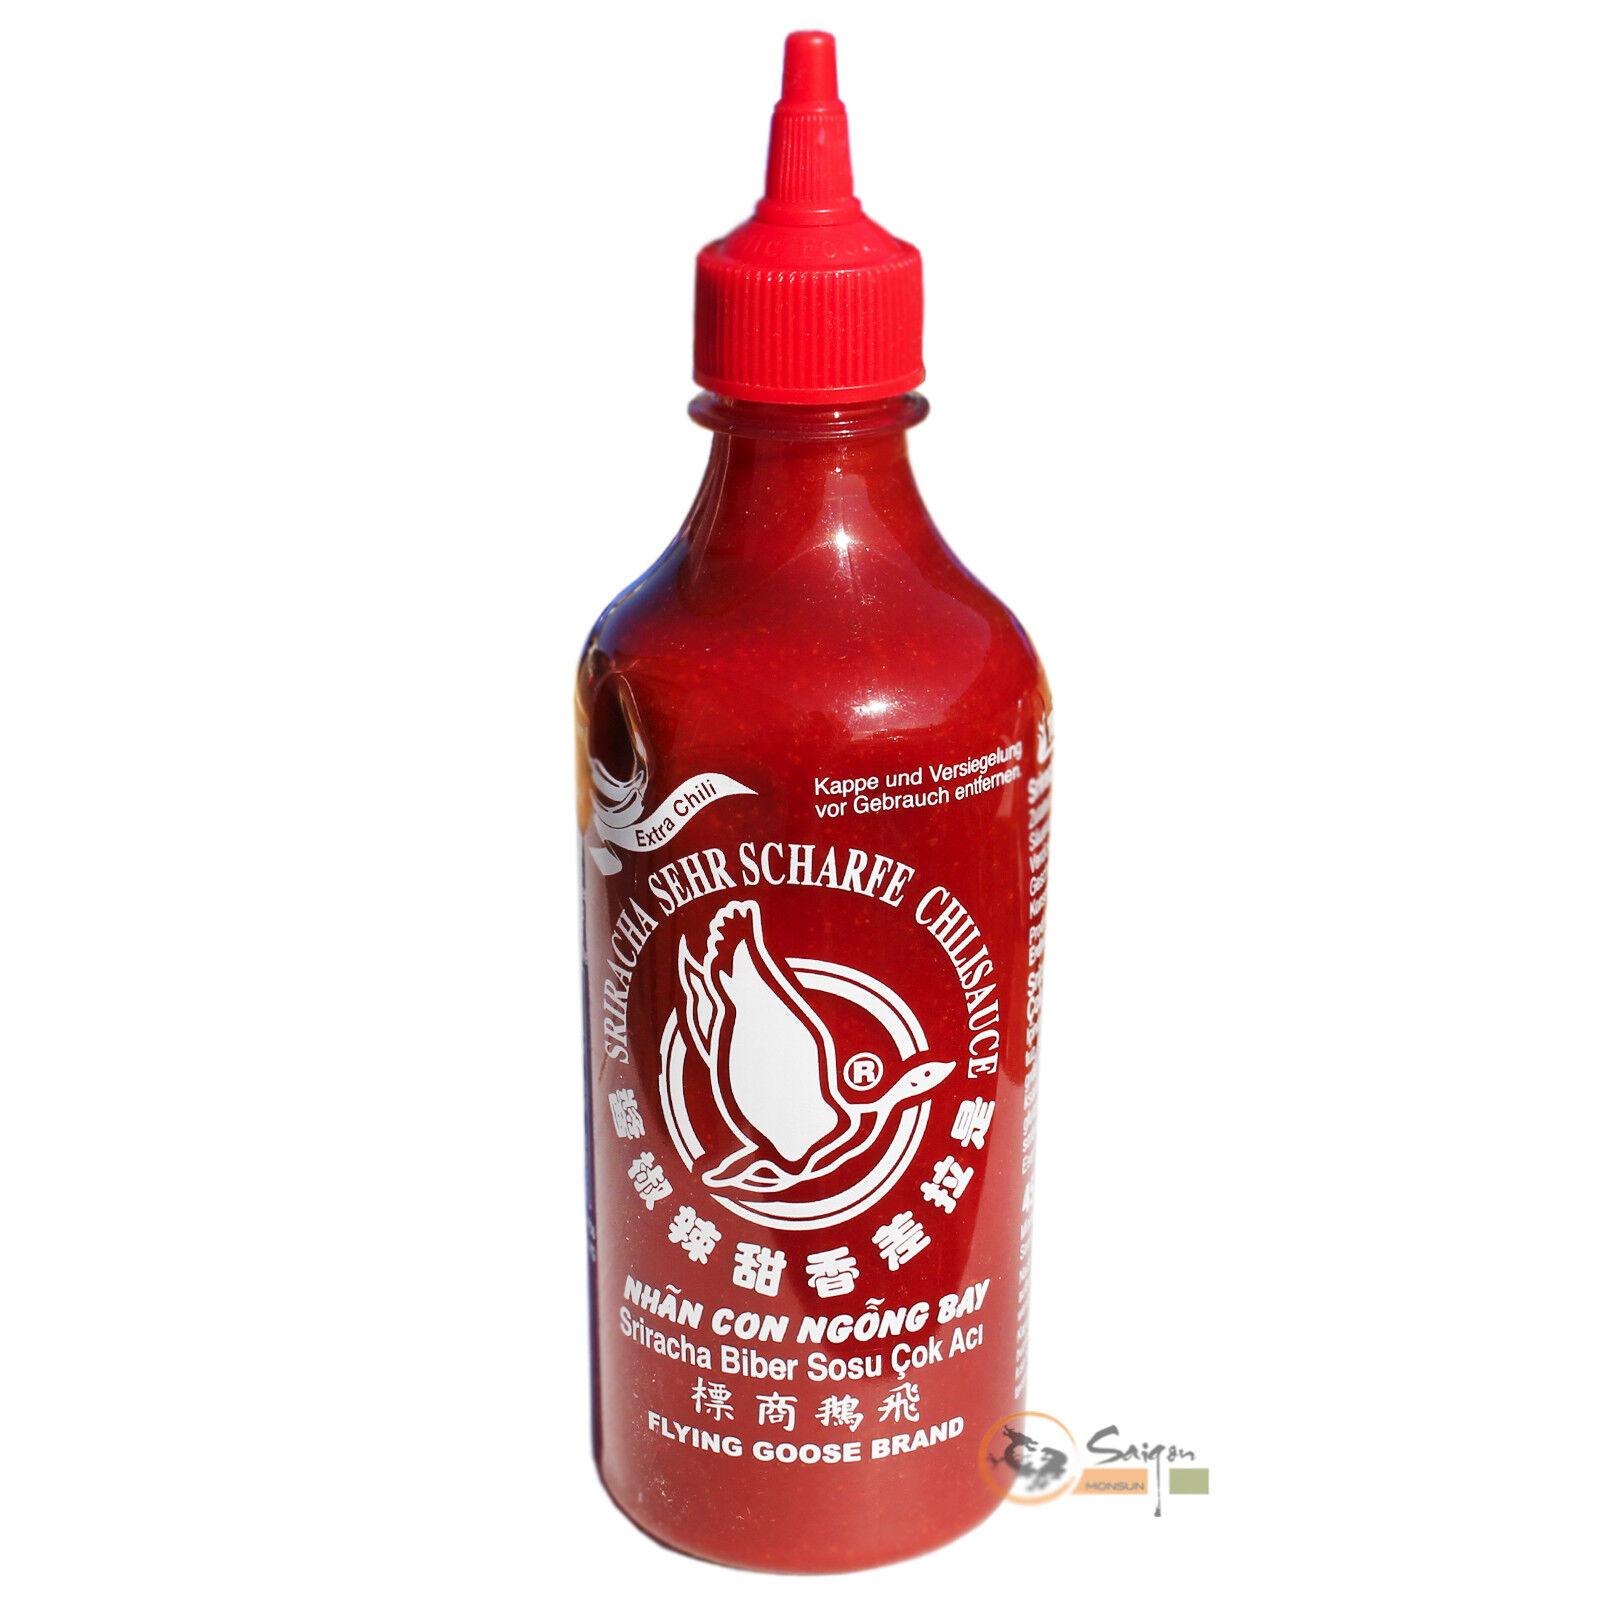 Flying Goose Hot Sriracha Chilisauce 455ml sehr scharfe Chilli Sauce Thailand